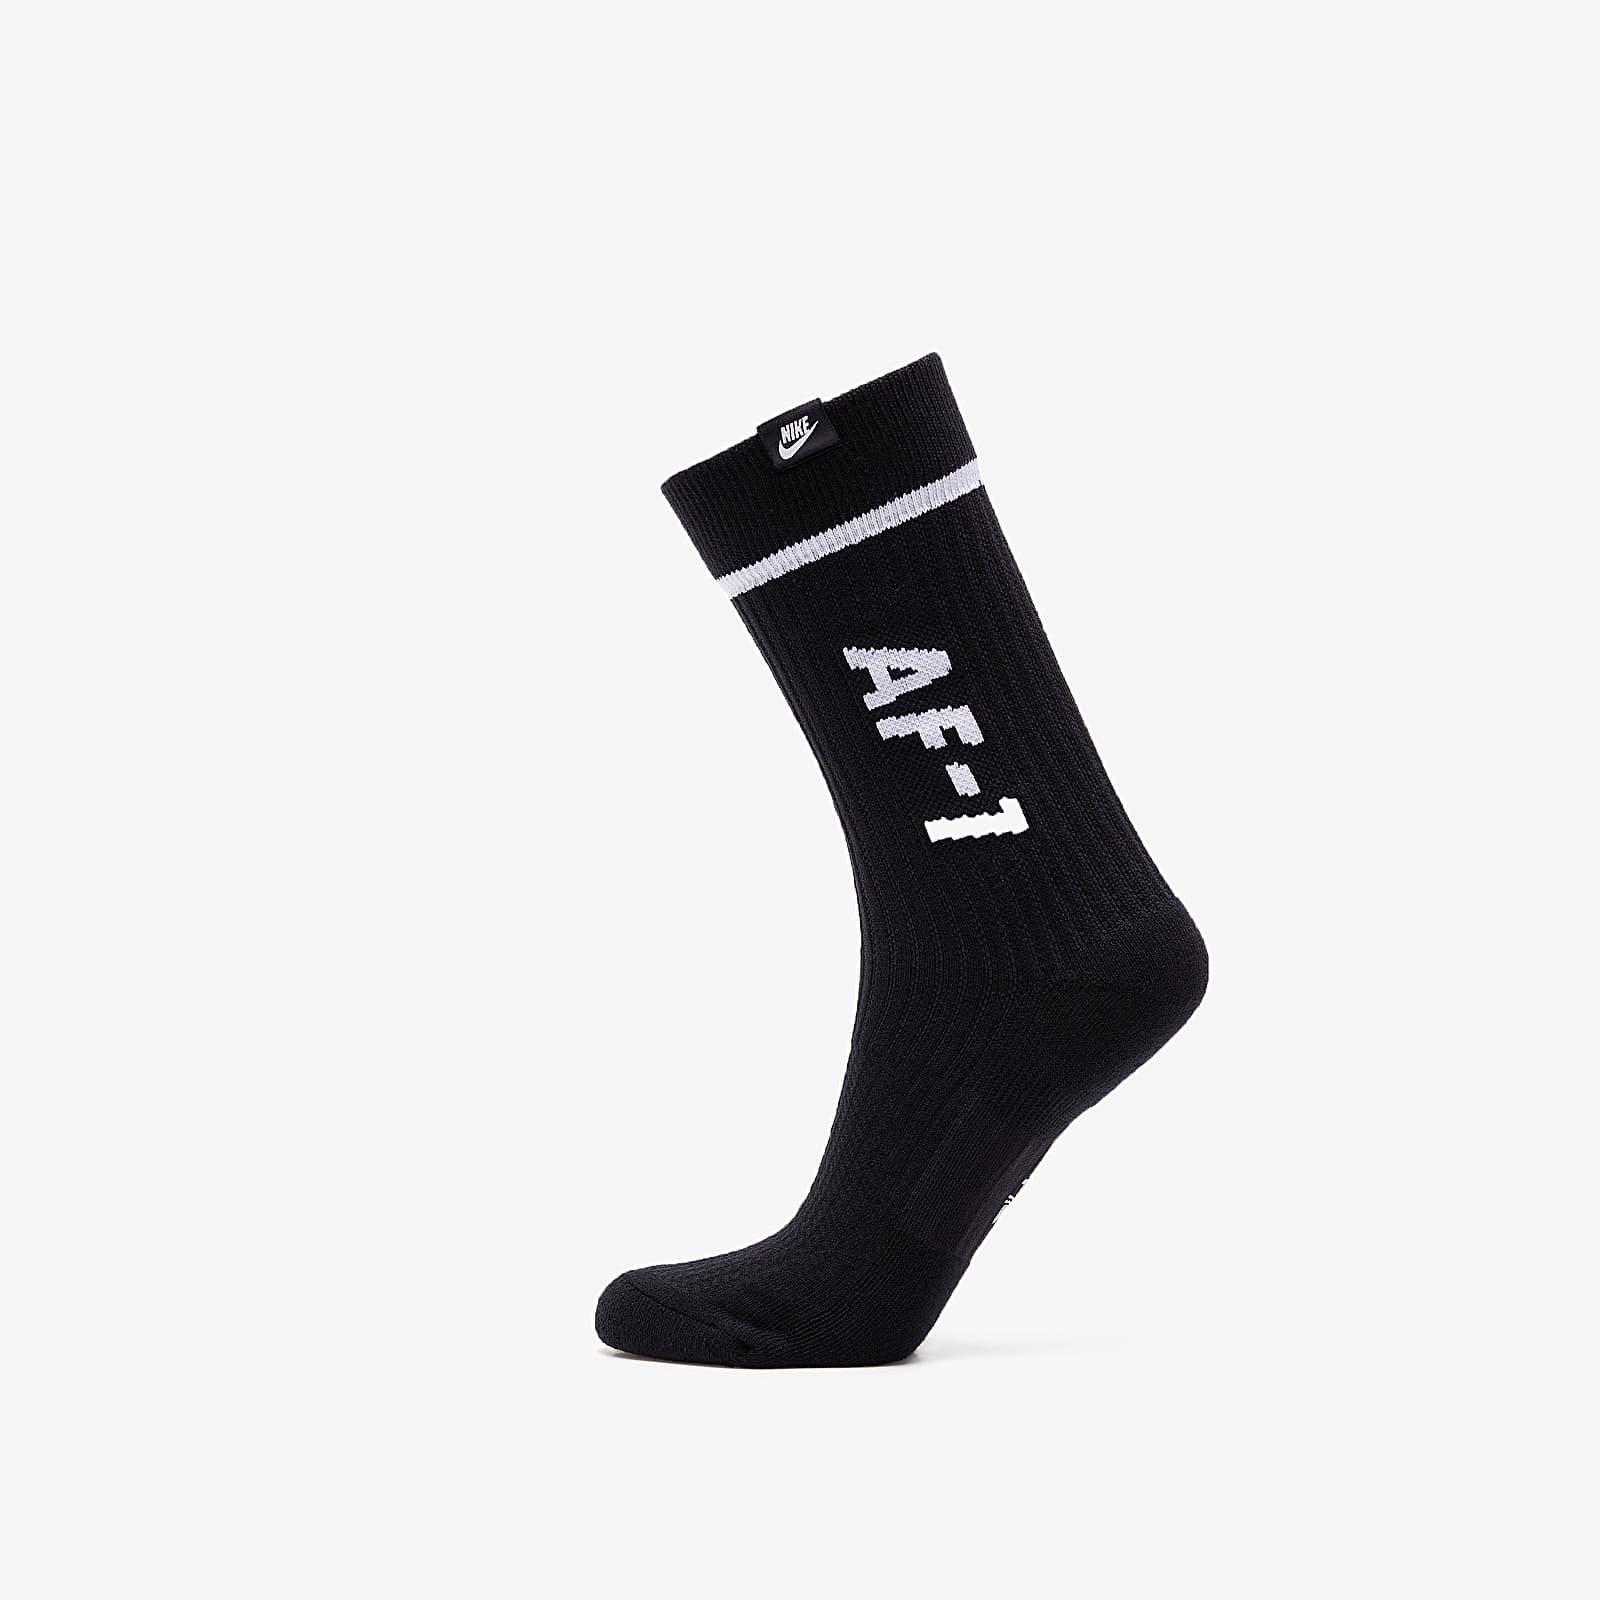 Everyday socks Nike Sportswear 2 Pack AF1 Sneaker Sox Crew Black/ White